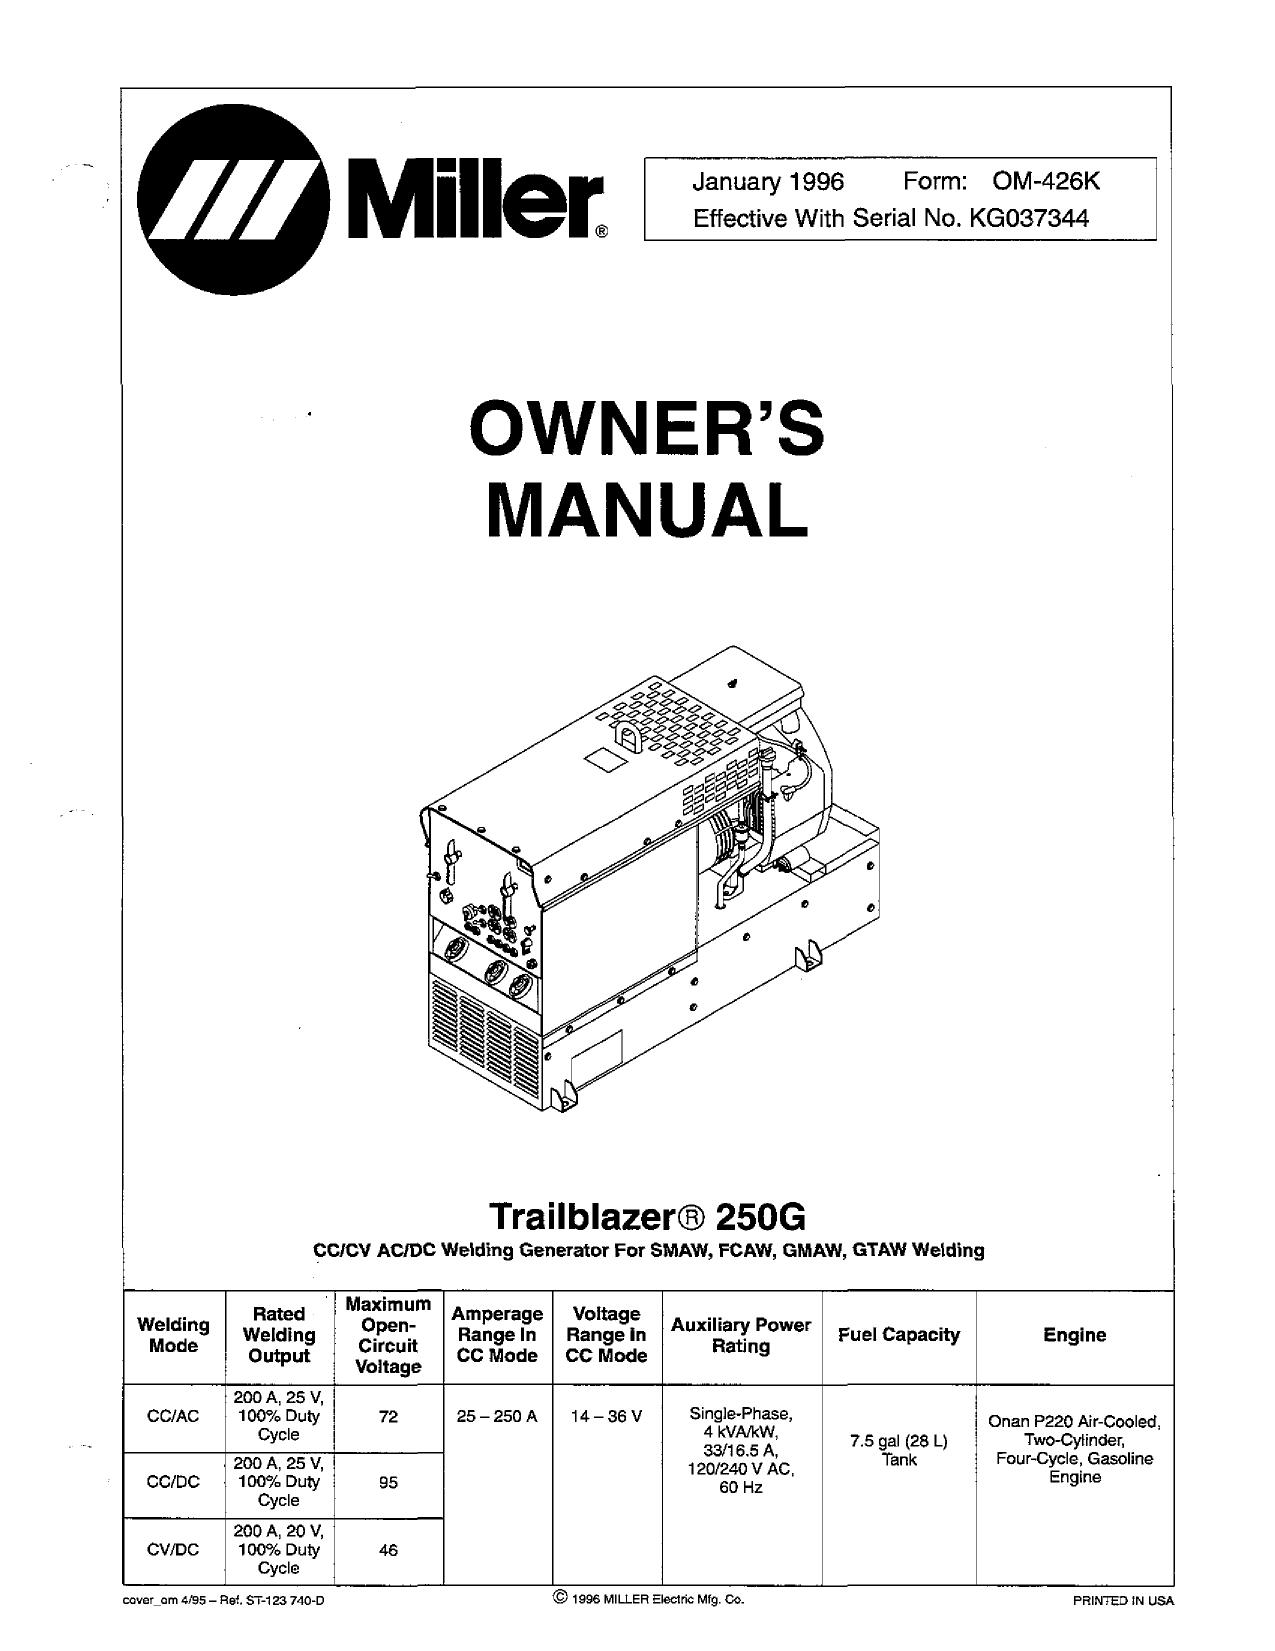 Miller TRAILBLAZER 250G User manual   Manualzzmanualzz